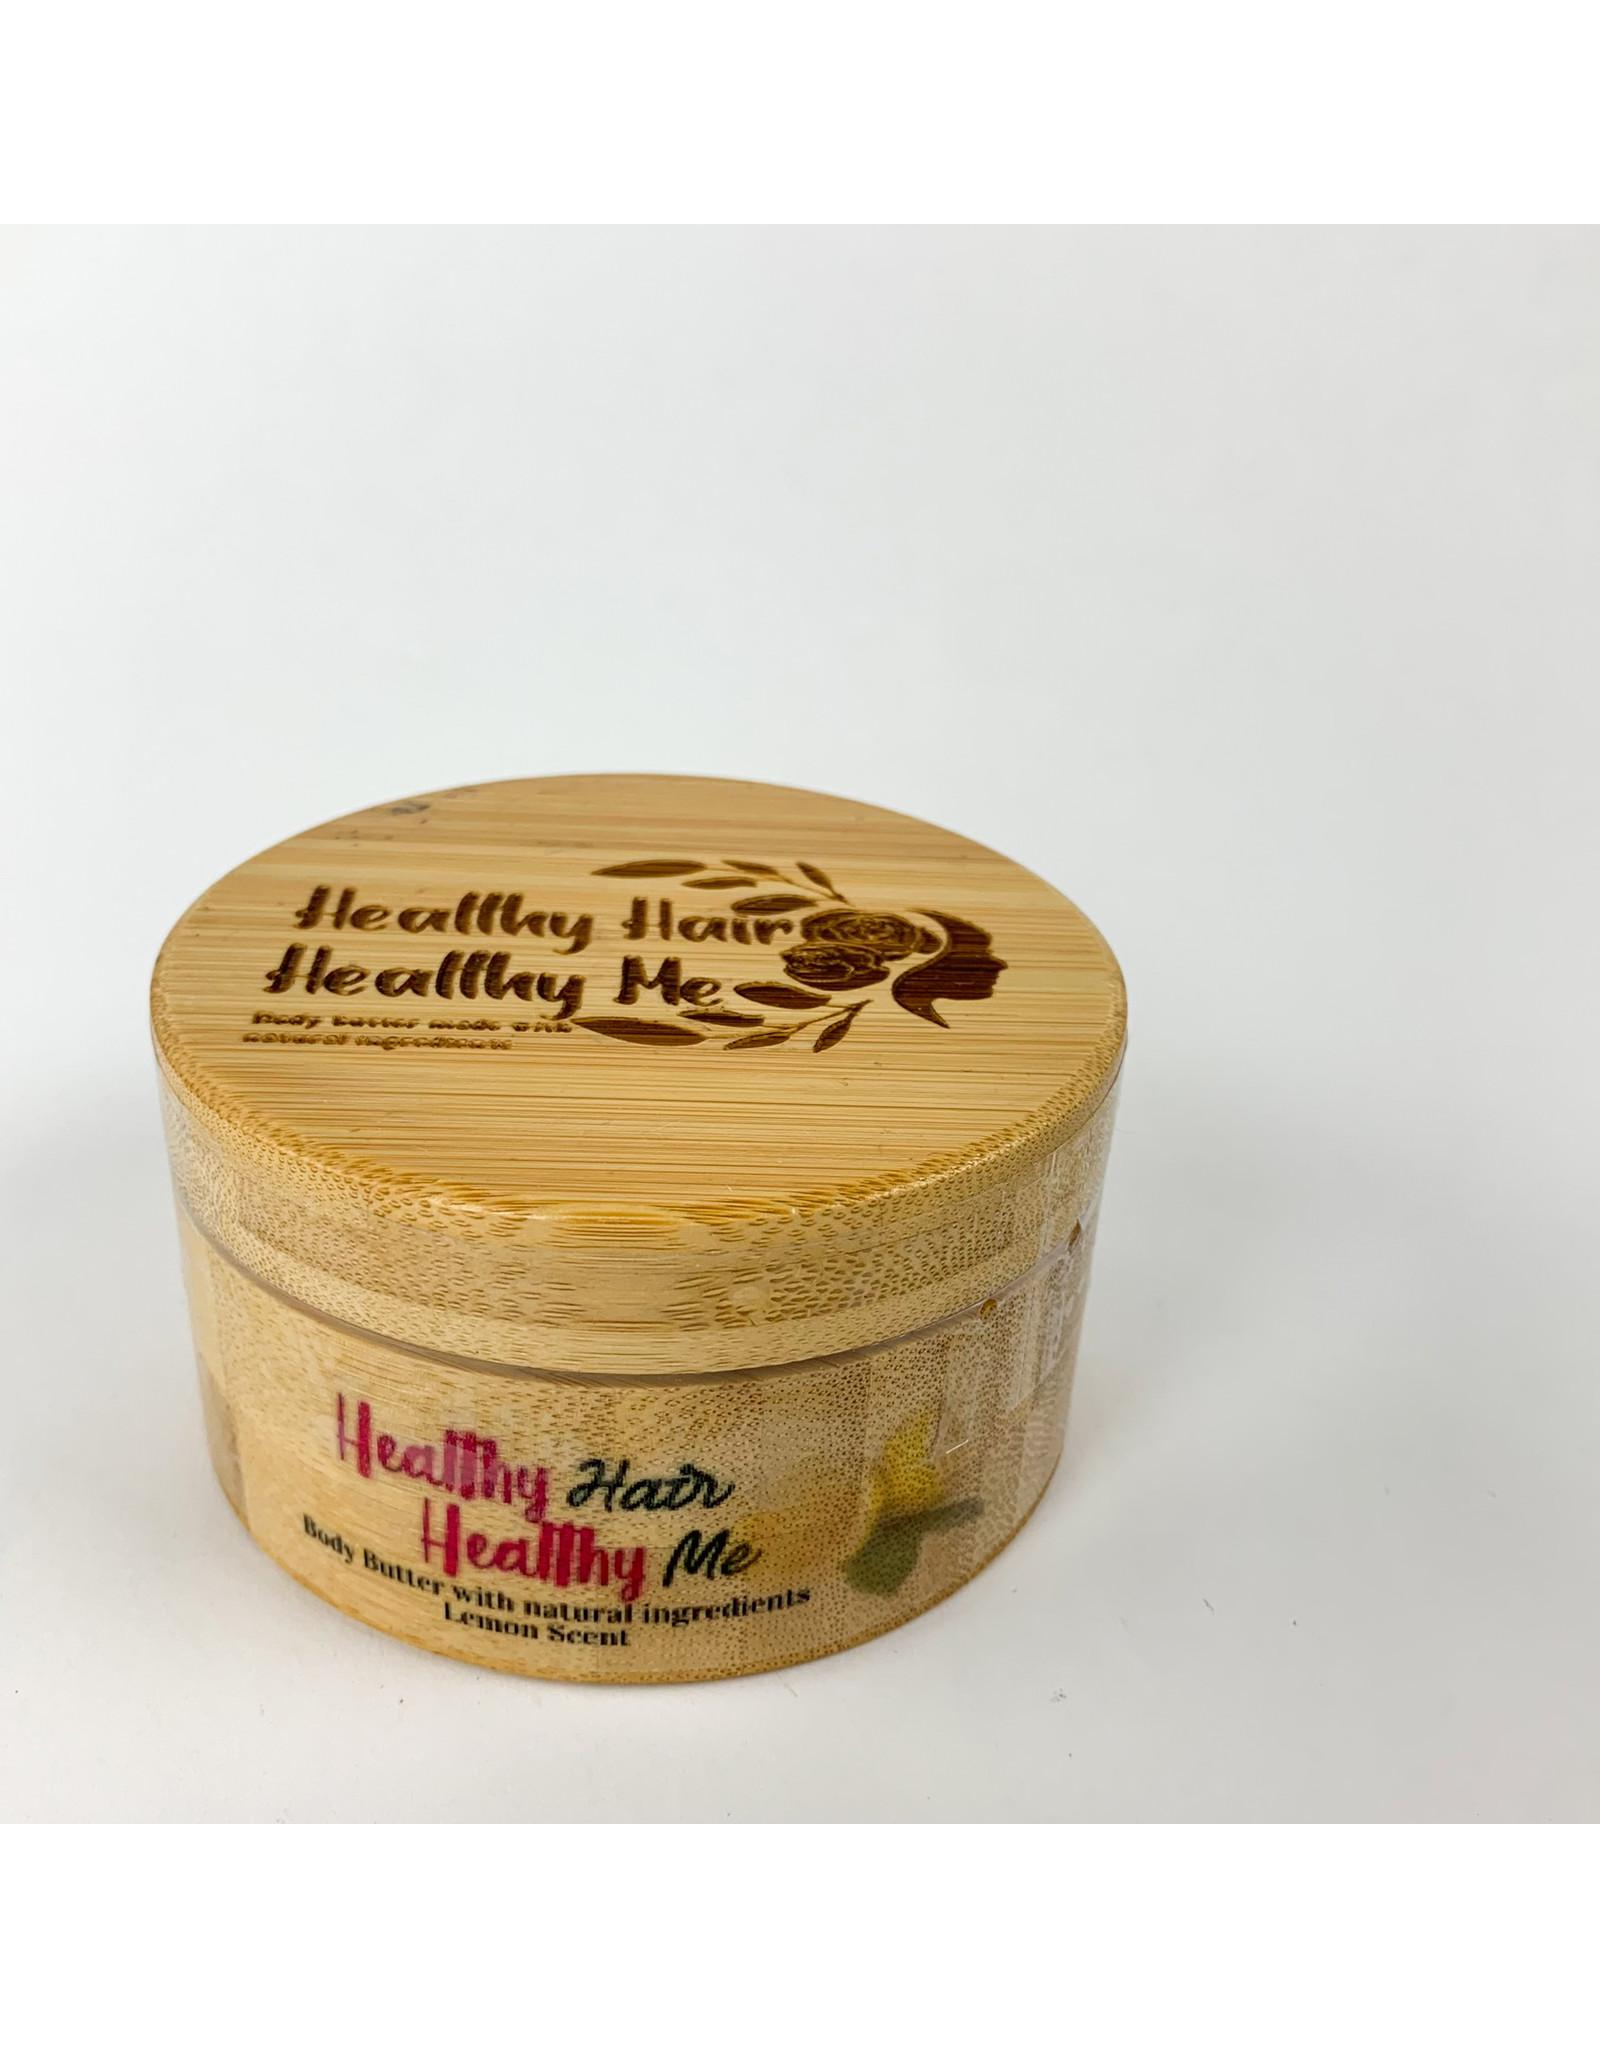 Healthy Hair Healthy Me Original Body Butter 6oz